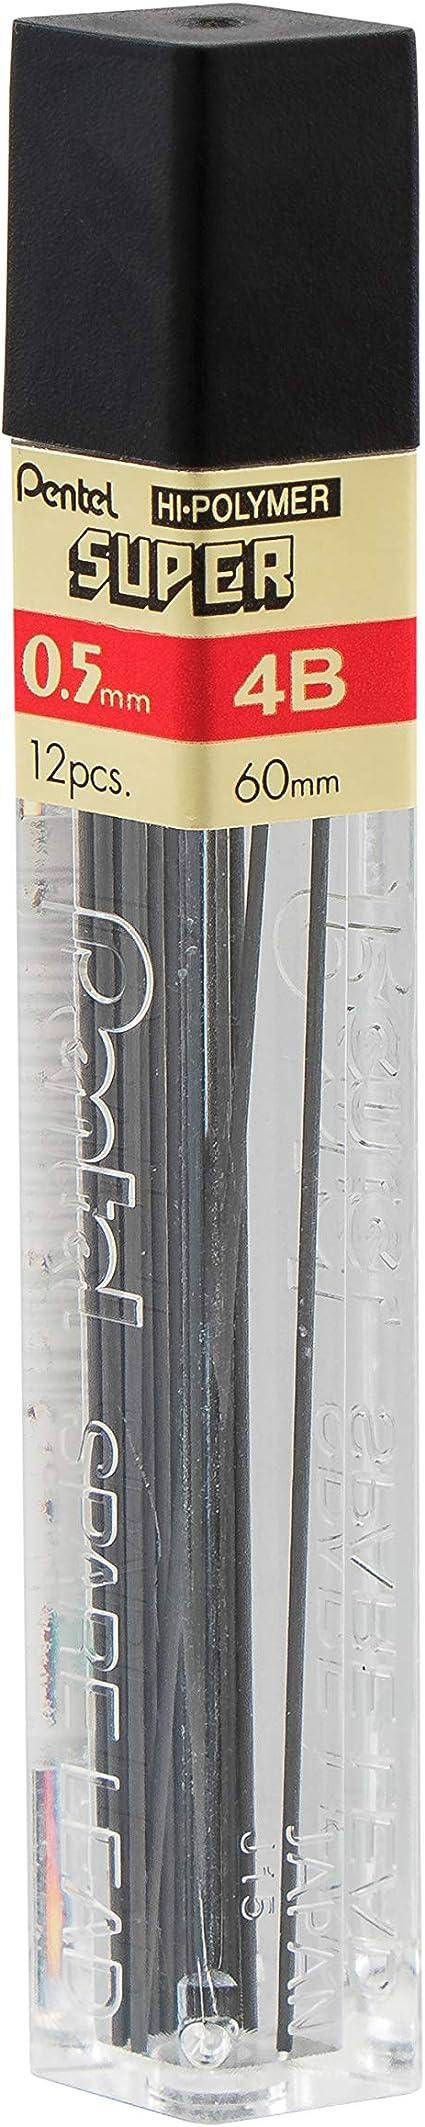 12 Minen 2H 0,5 mm Pentel Druckbleistift Mine HI POLYMER SUPER Härtegrad